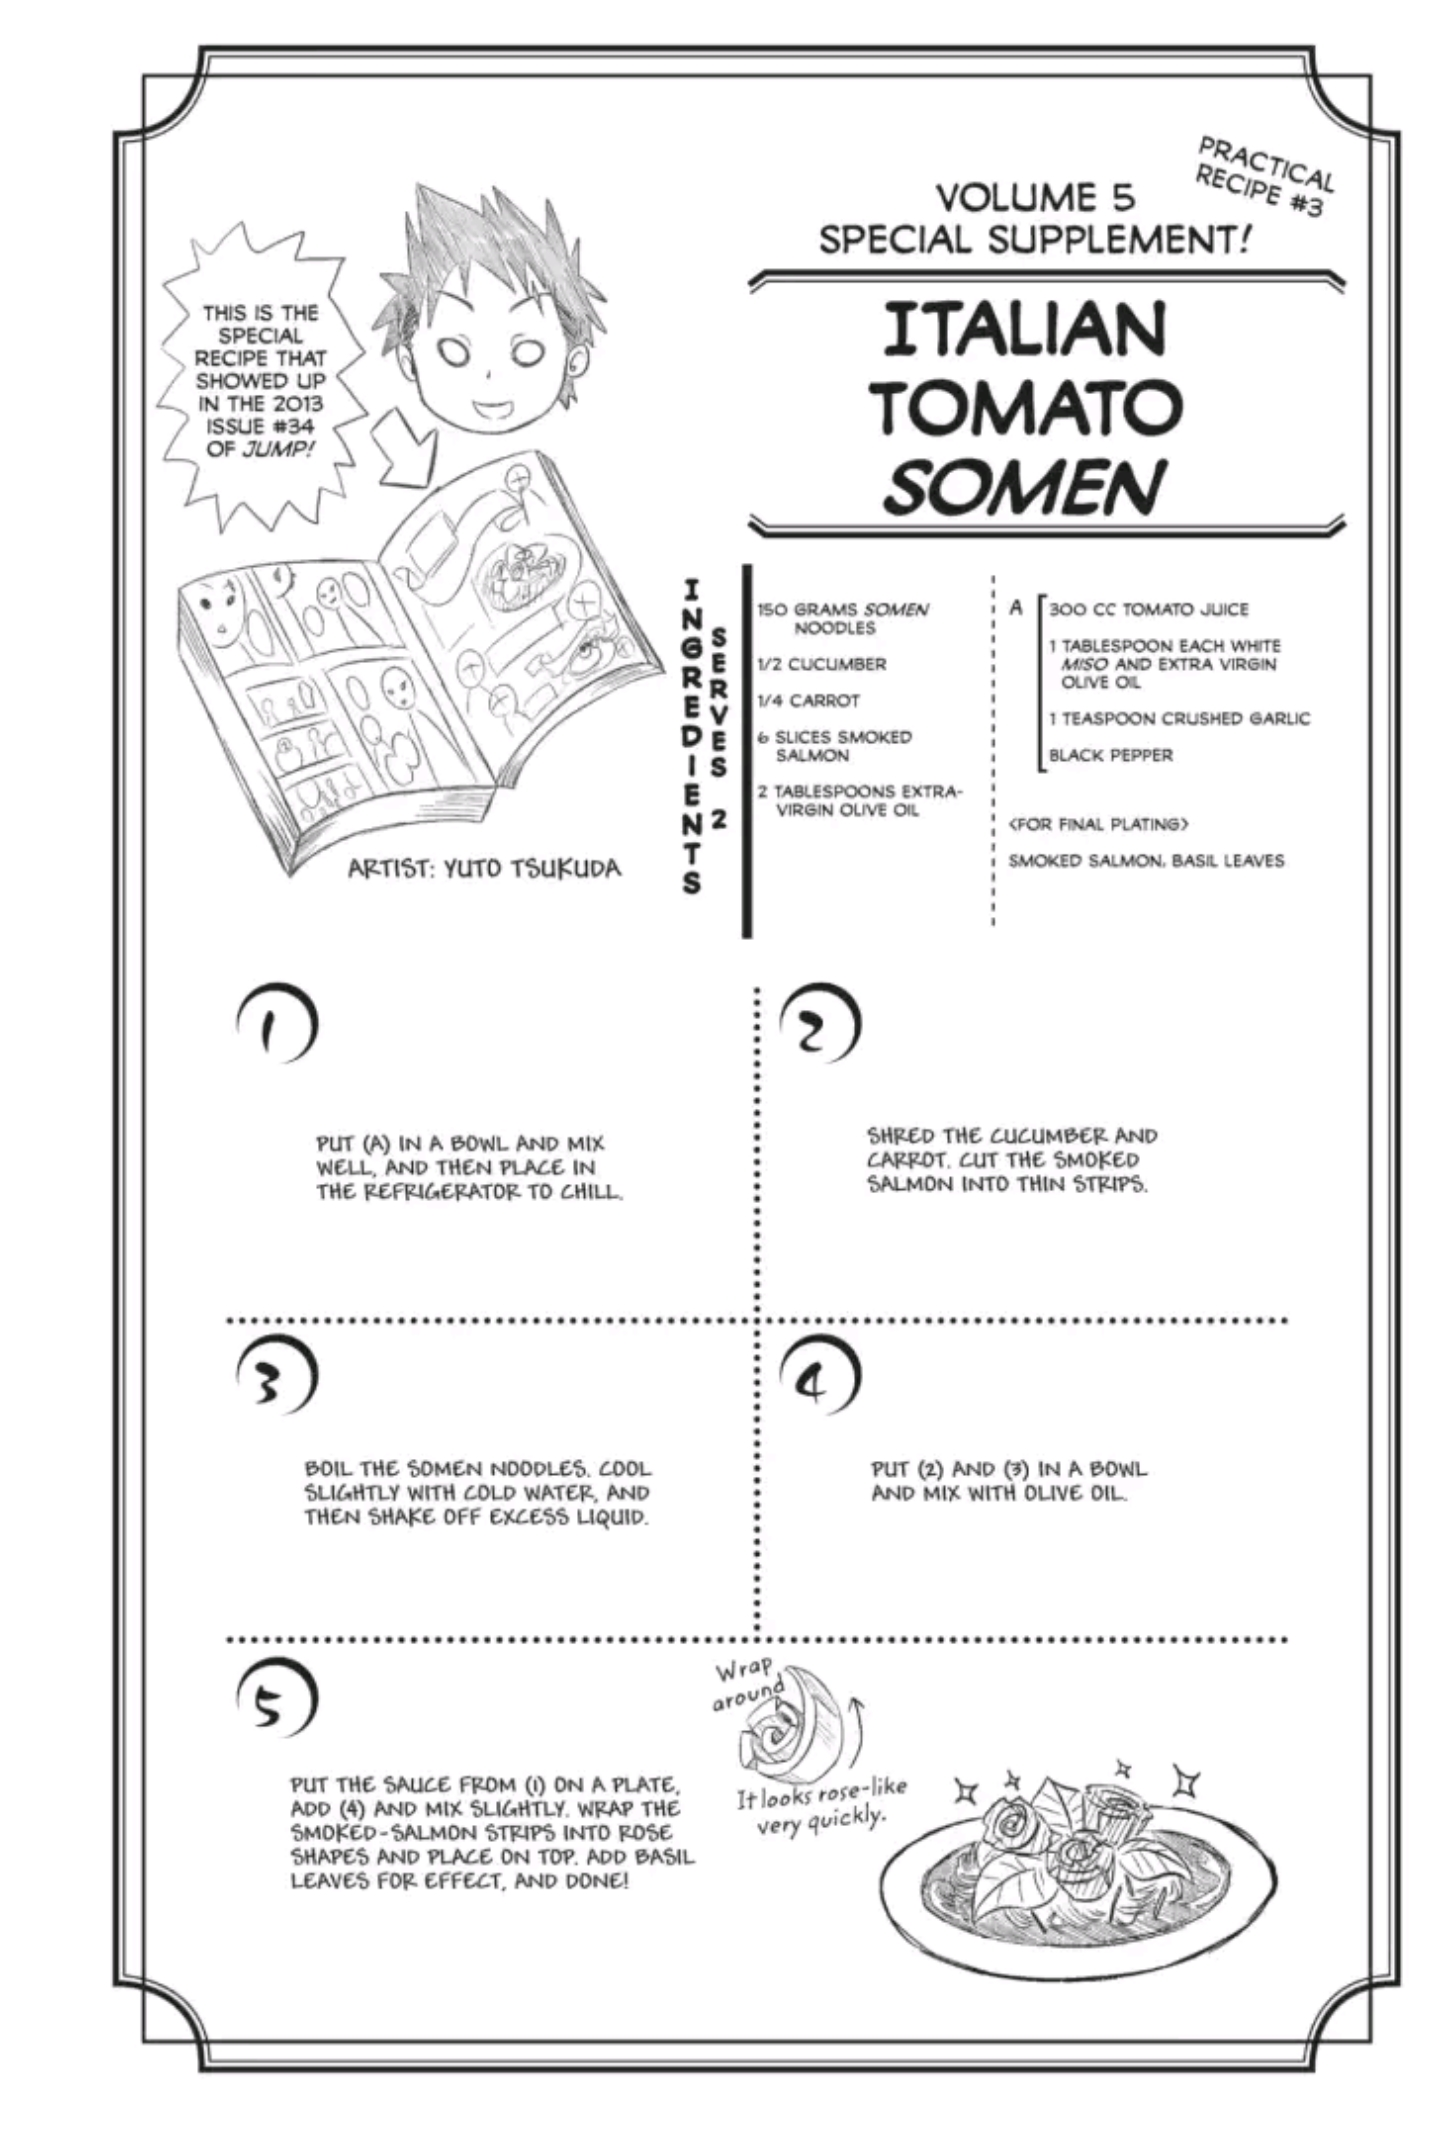 Image - Jump Special Dish | Shokugeki no Soma Wiki | FANDOM